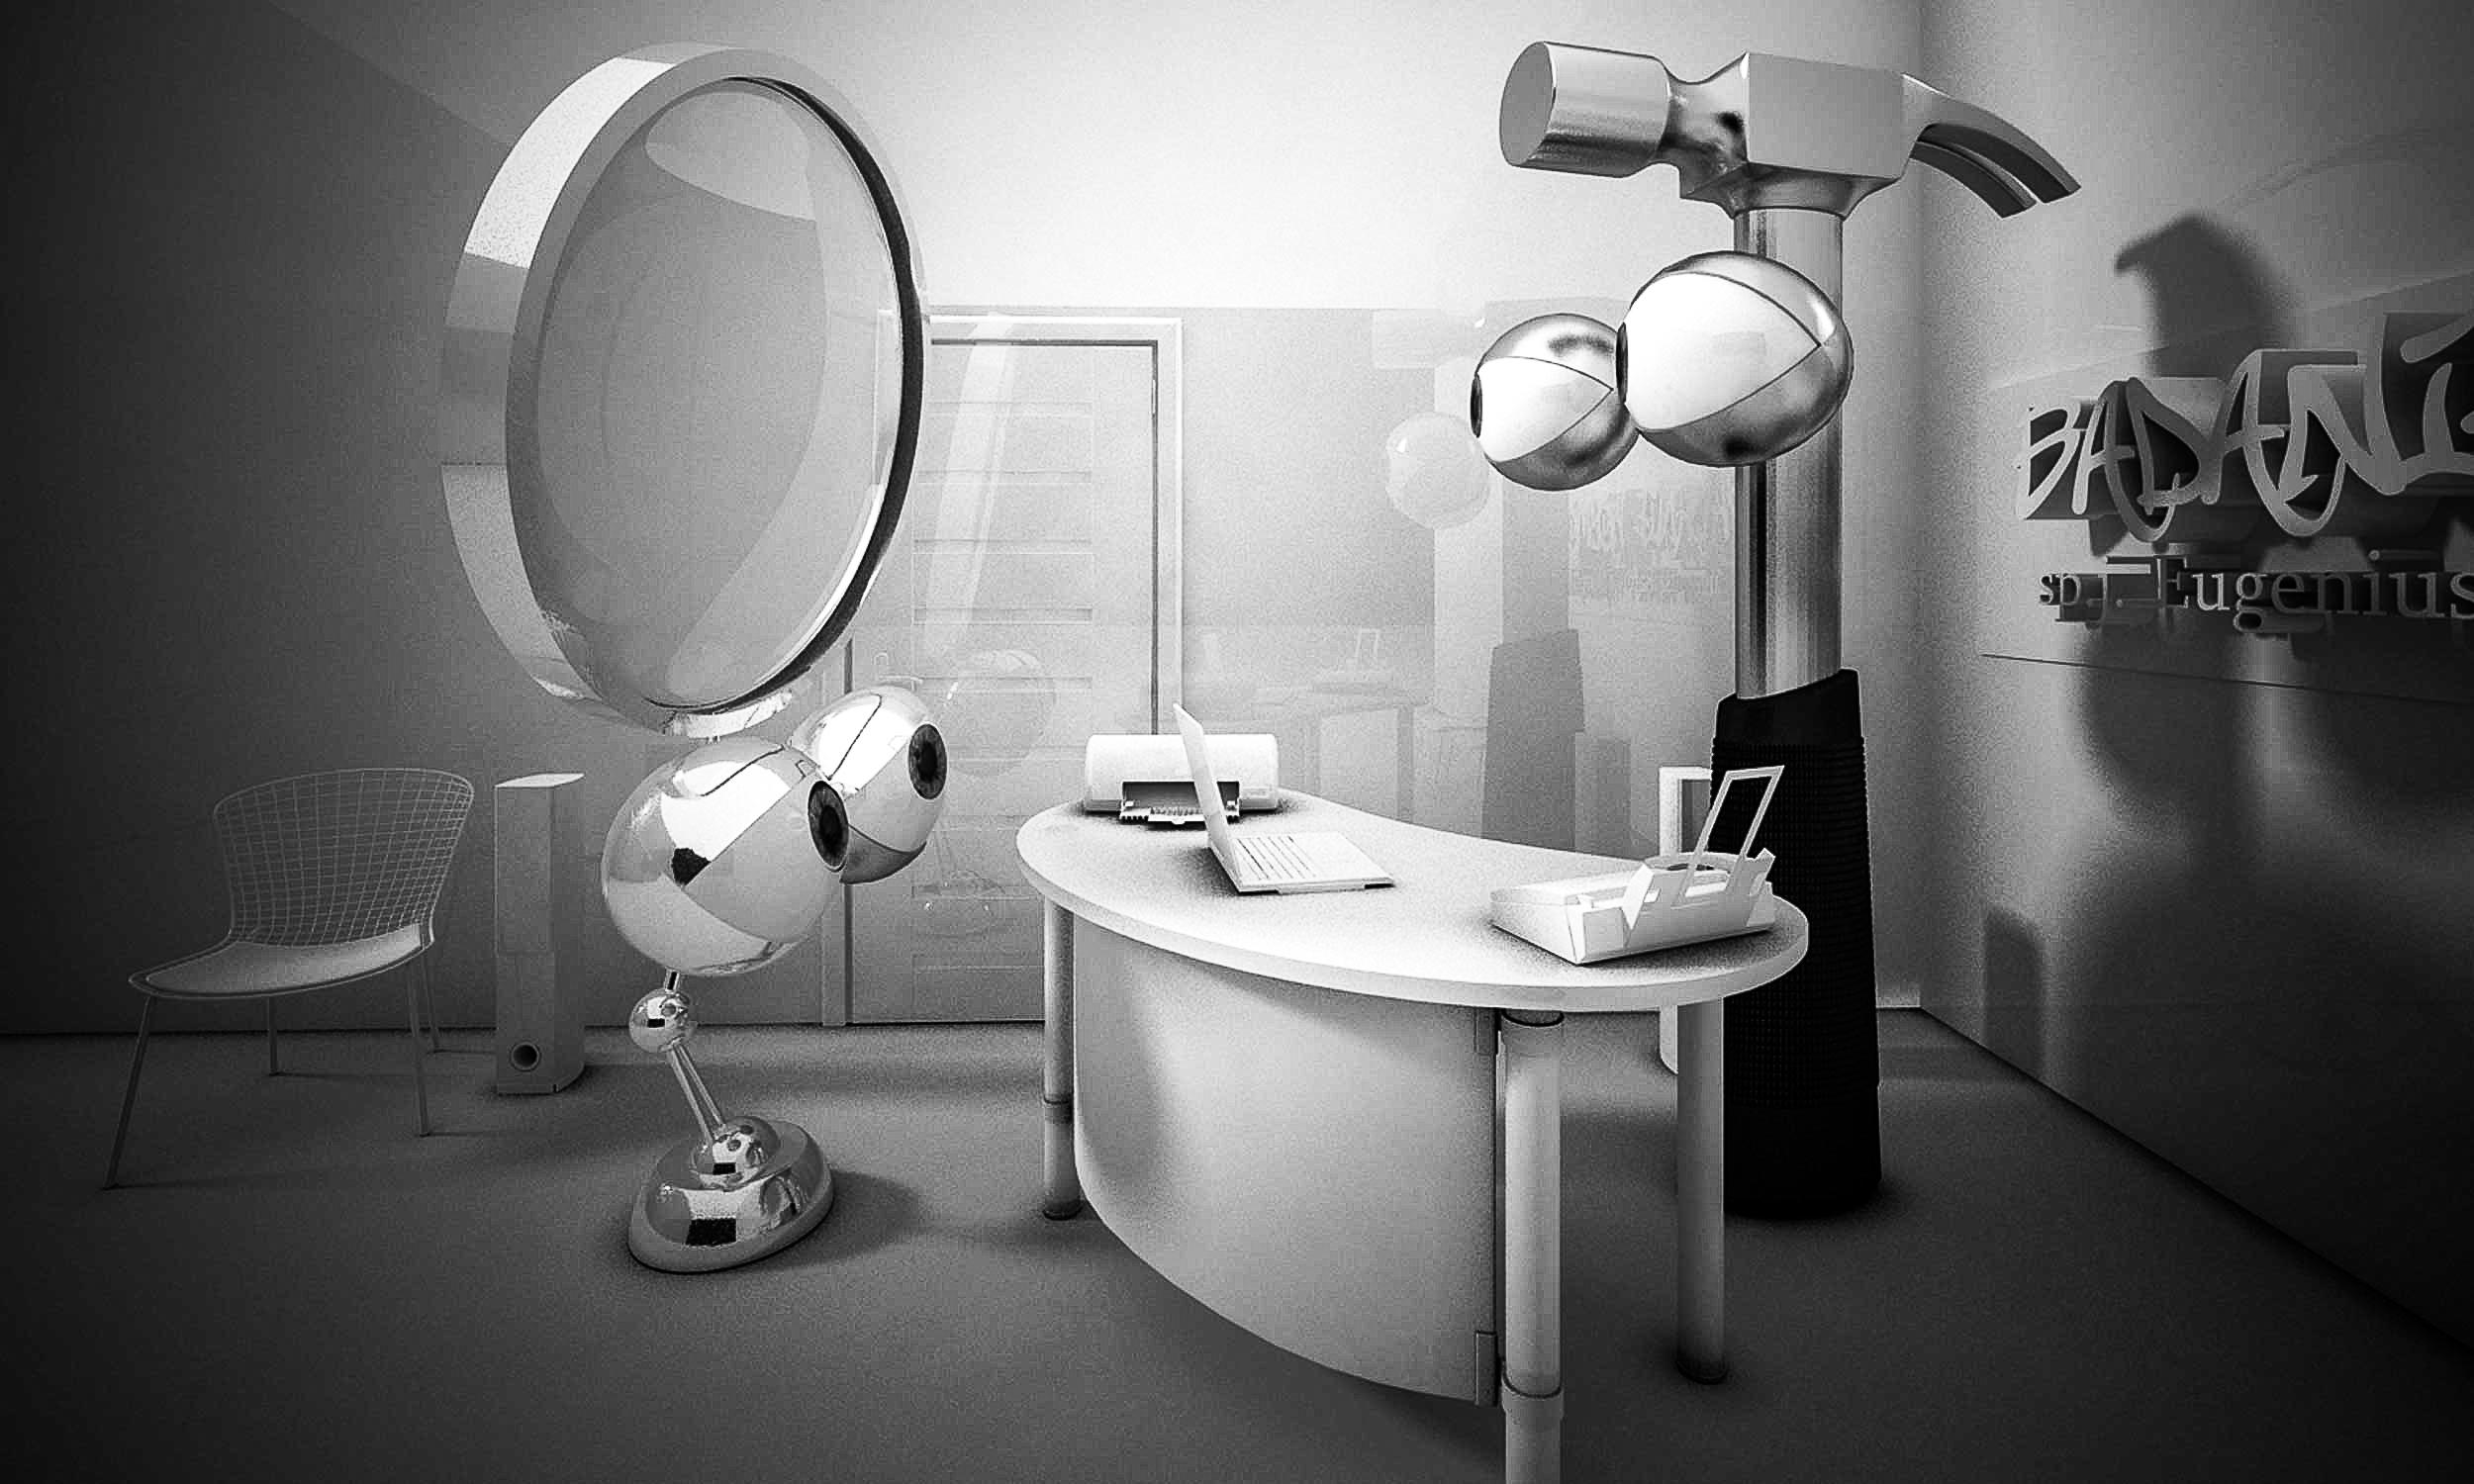 artur-klamut-rendering-ligtroom-presets-3